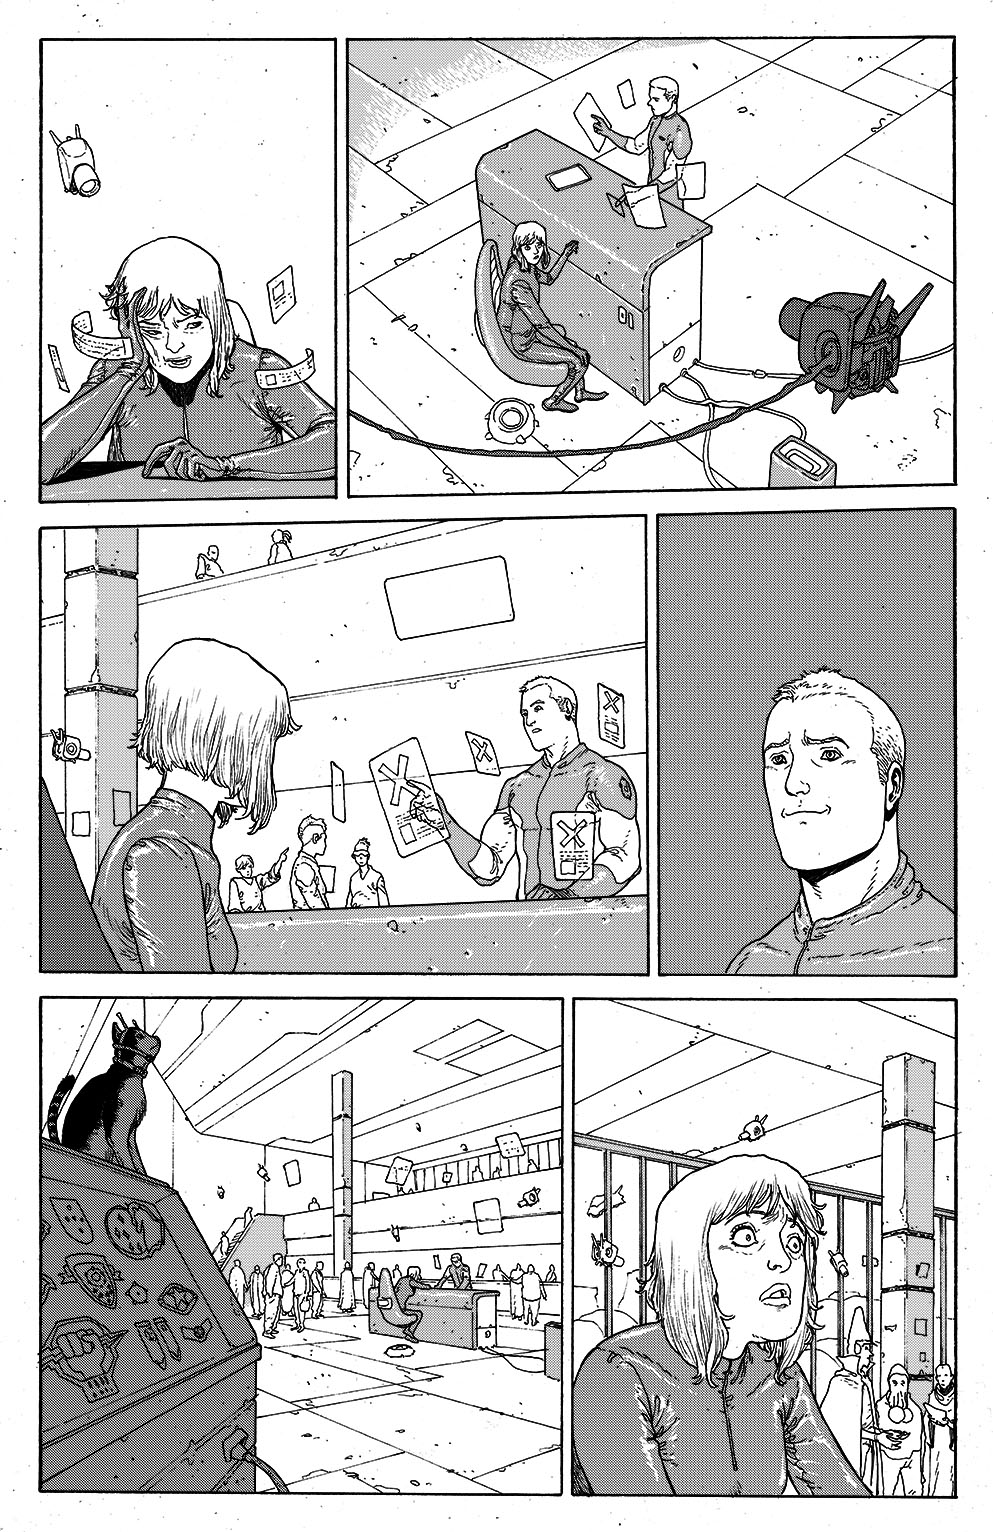 LegionALA_page28.jpeg